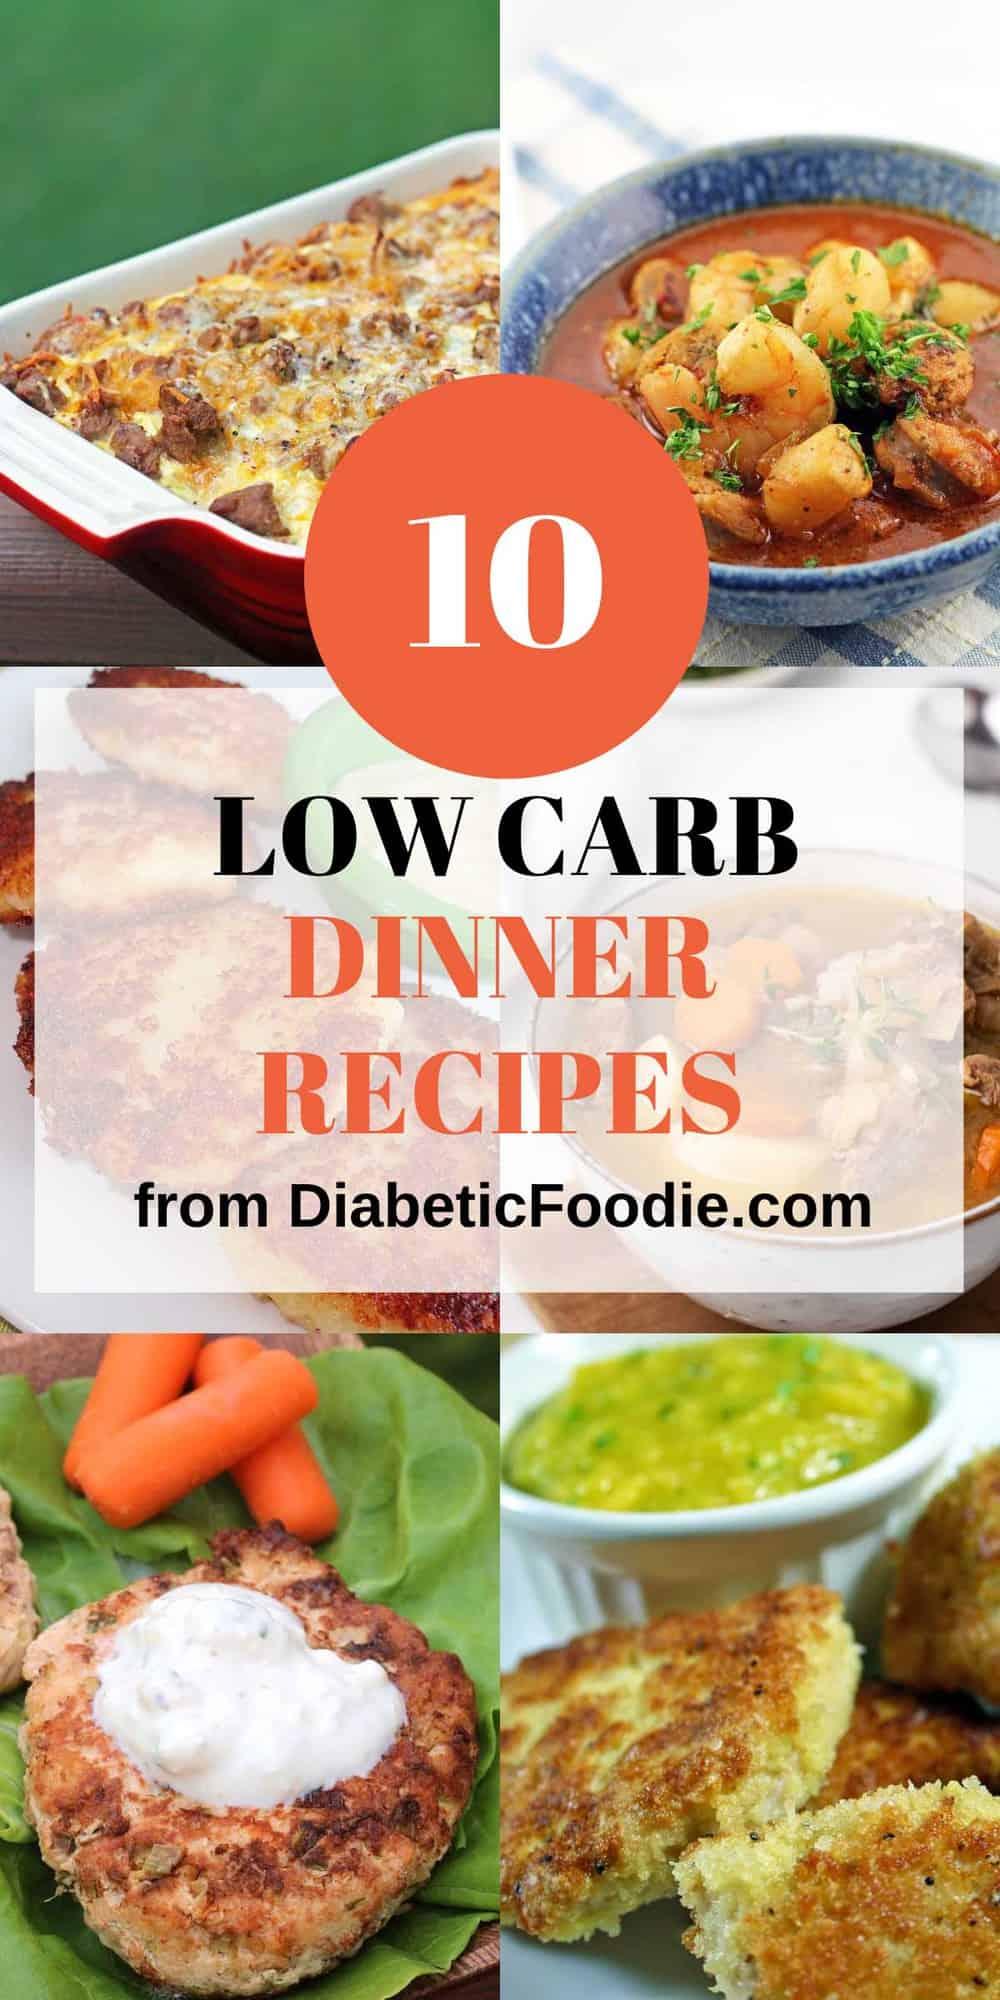 Low-Carb Dinner Recipes for Diabetics